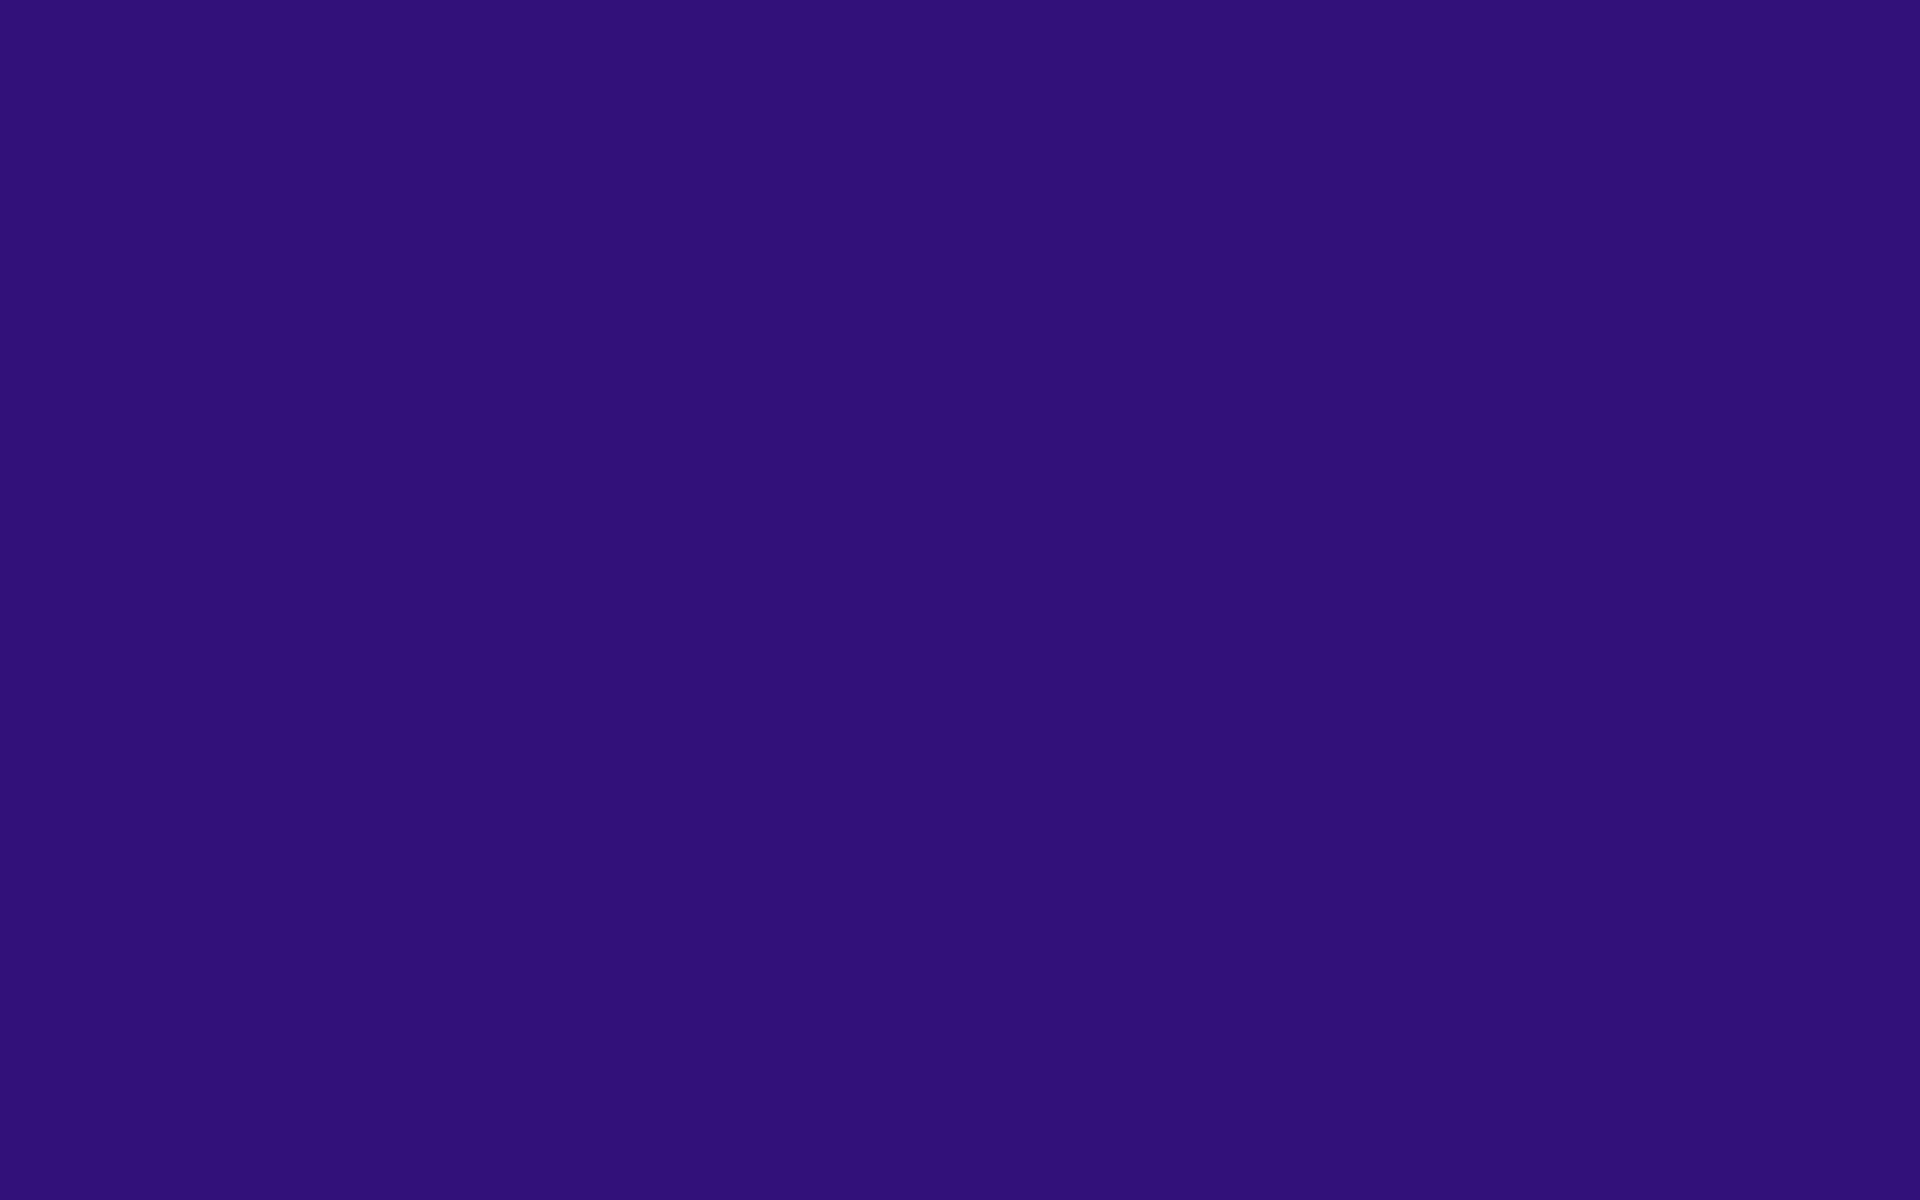 1920x1200 Persian Indigo Solid Color Background